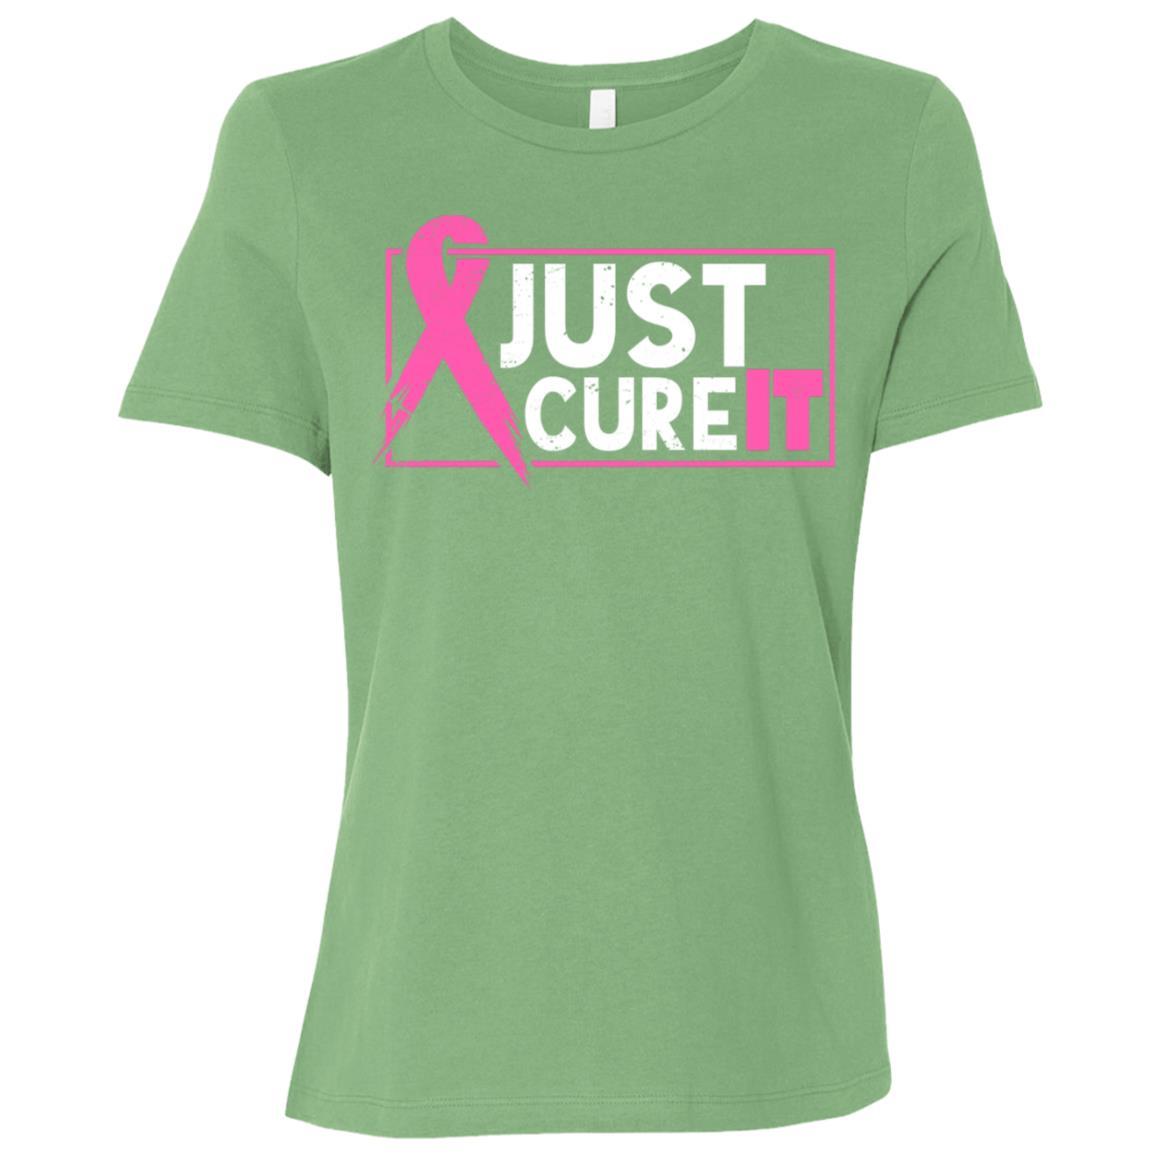 Just Cure It Women Short Sleeve T-Shirt